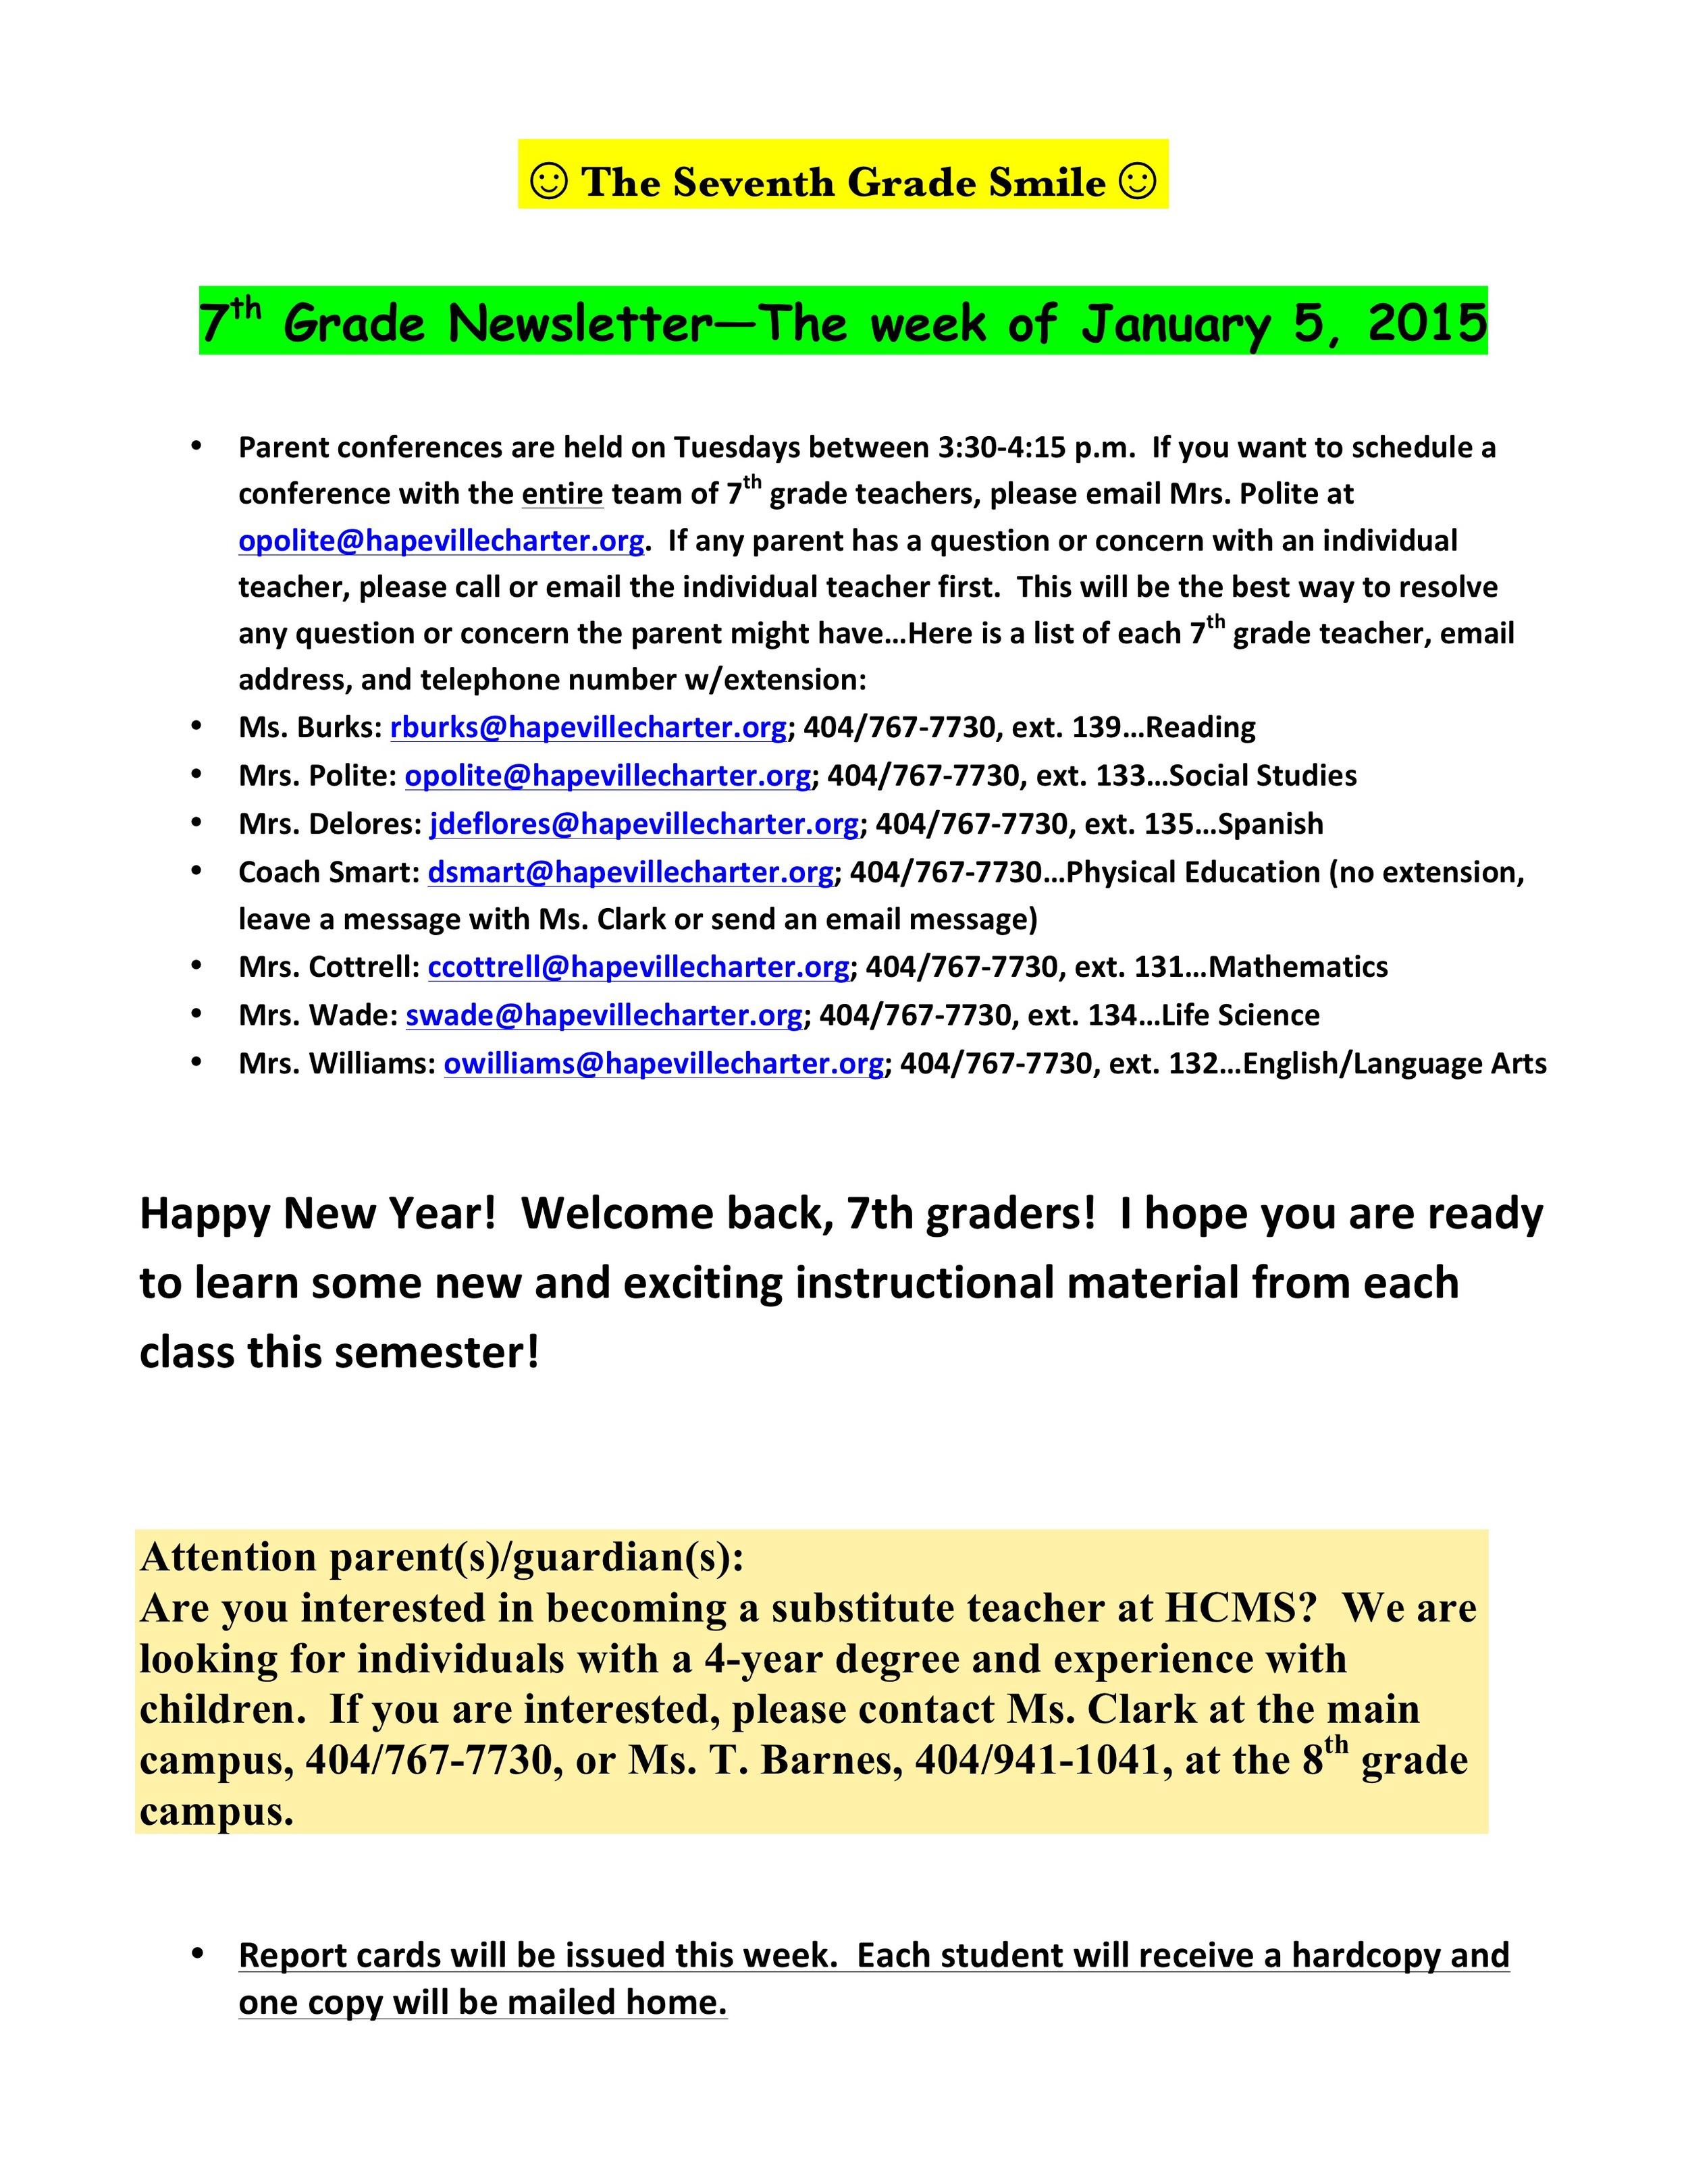 Newsletter Image7th grade January 6 2015.jpeg